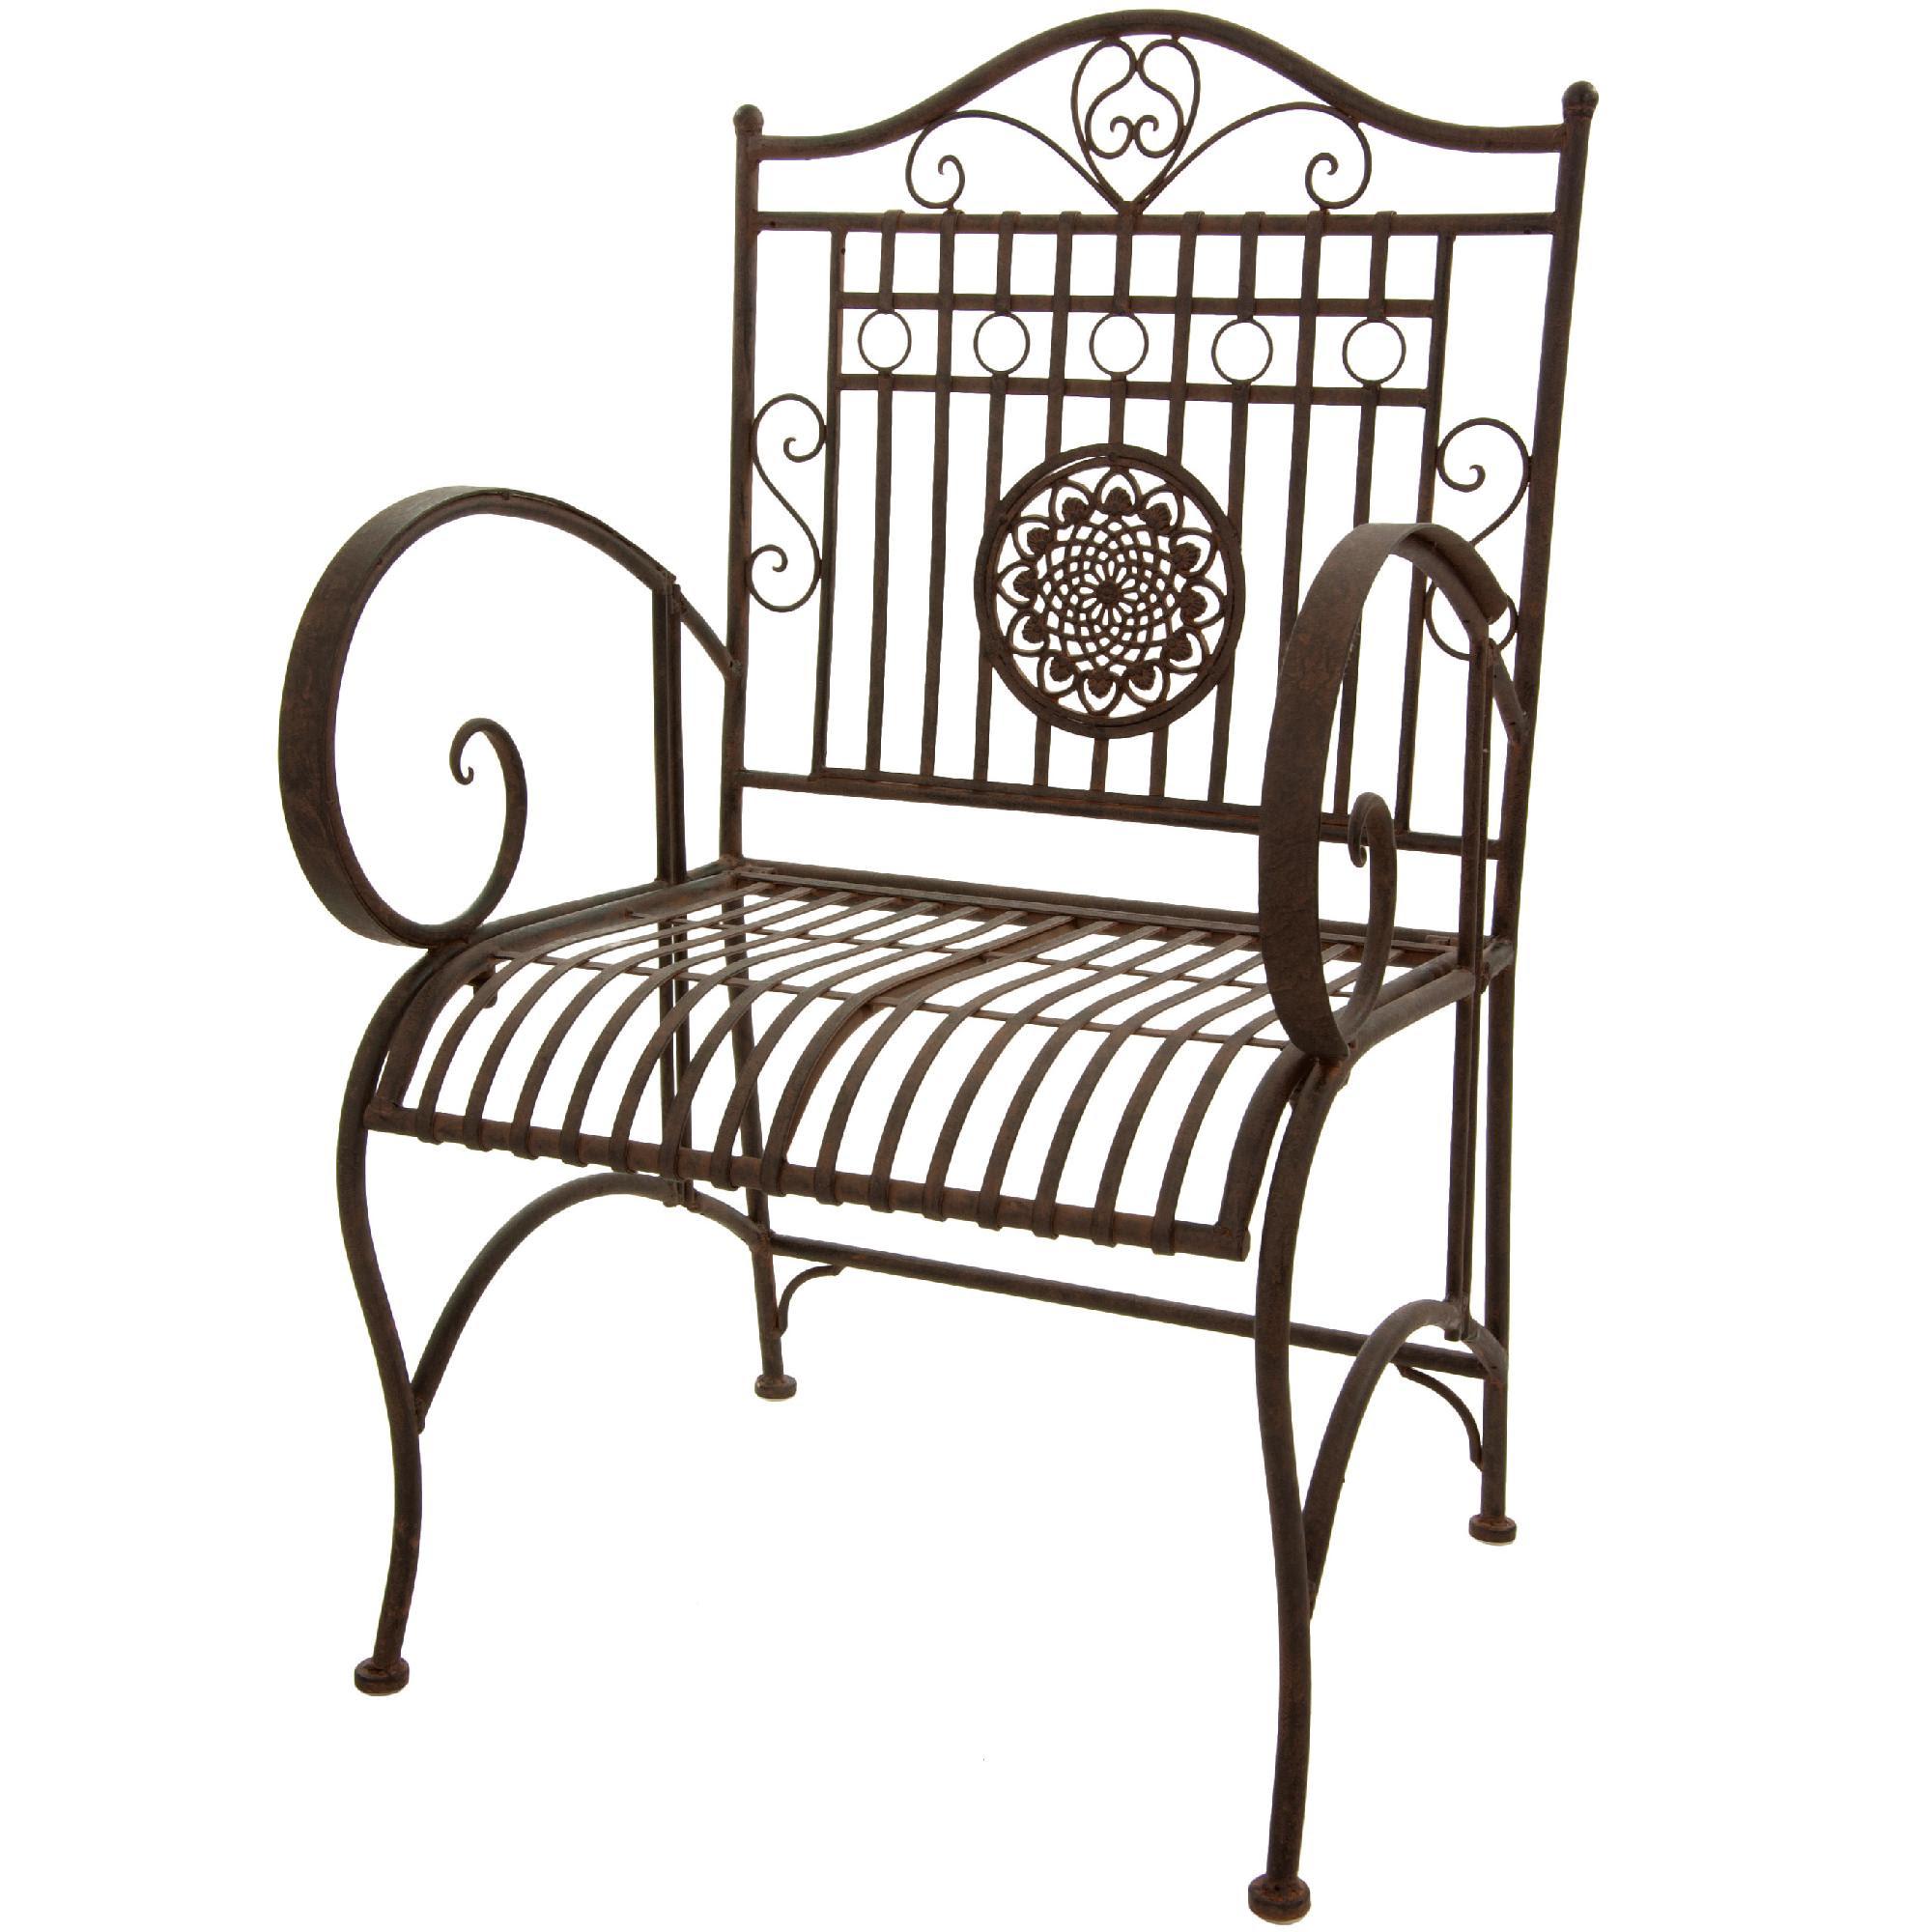 Oriental Furniture Rustic Wrought Iron Garden Chair - Rust ...